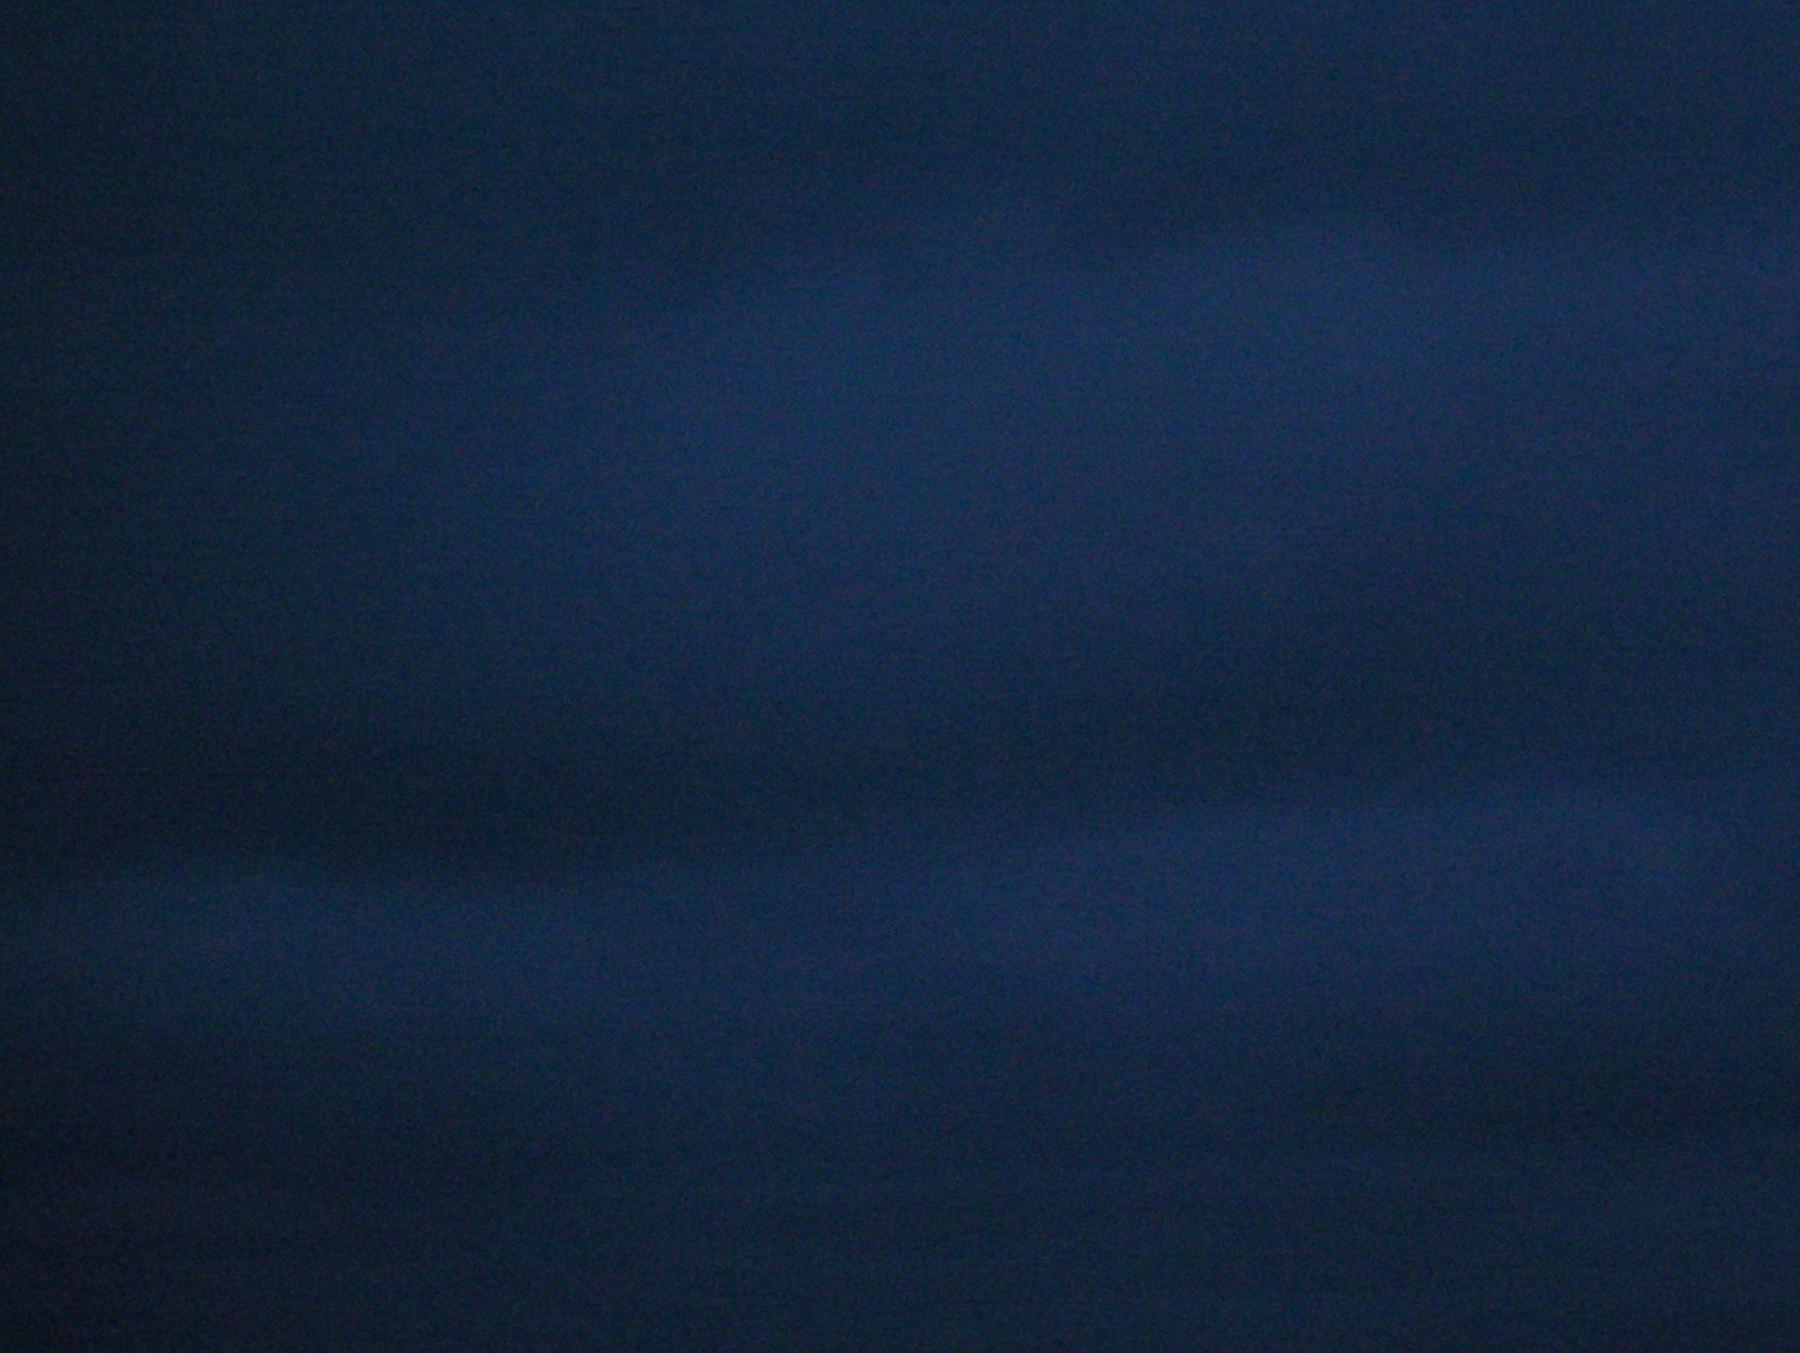 dark blue sky with - photo #16